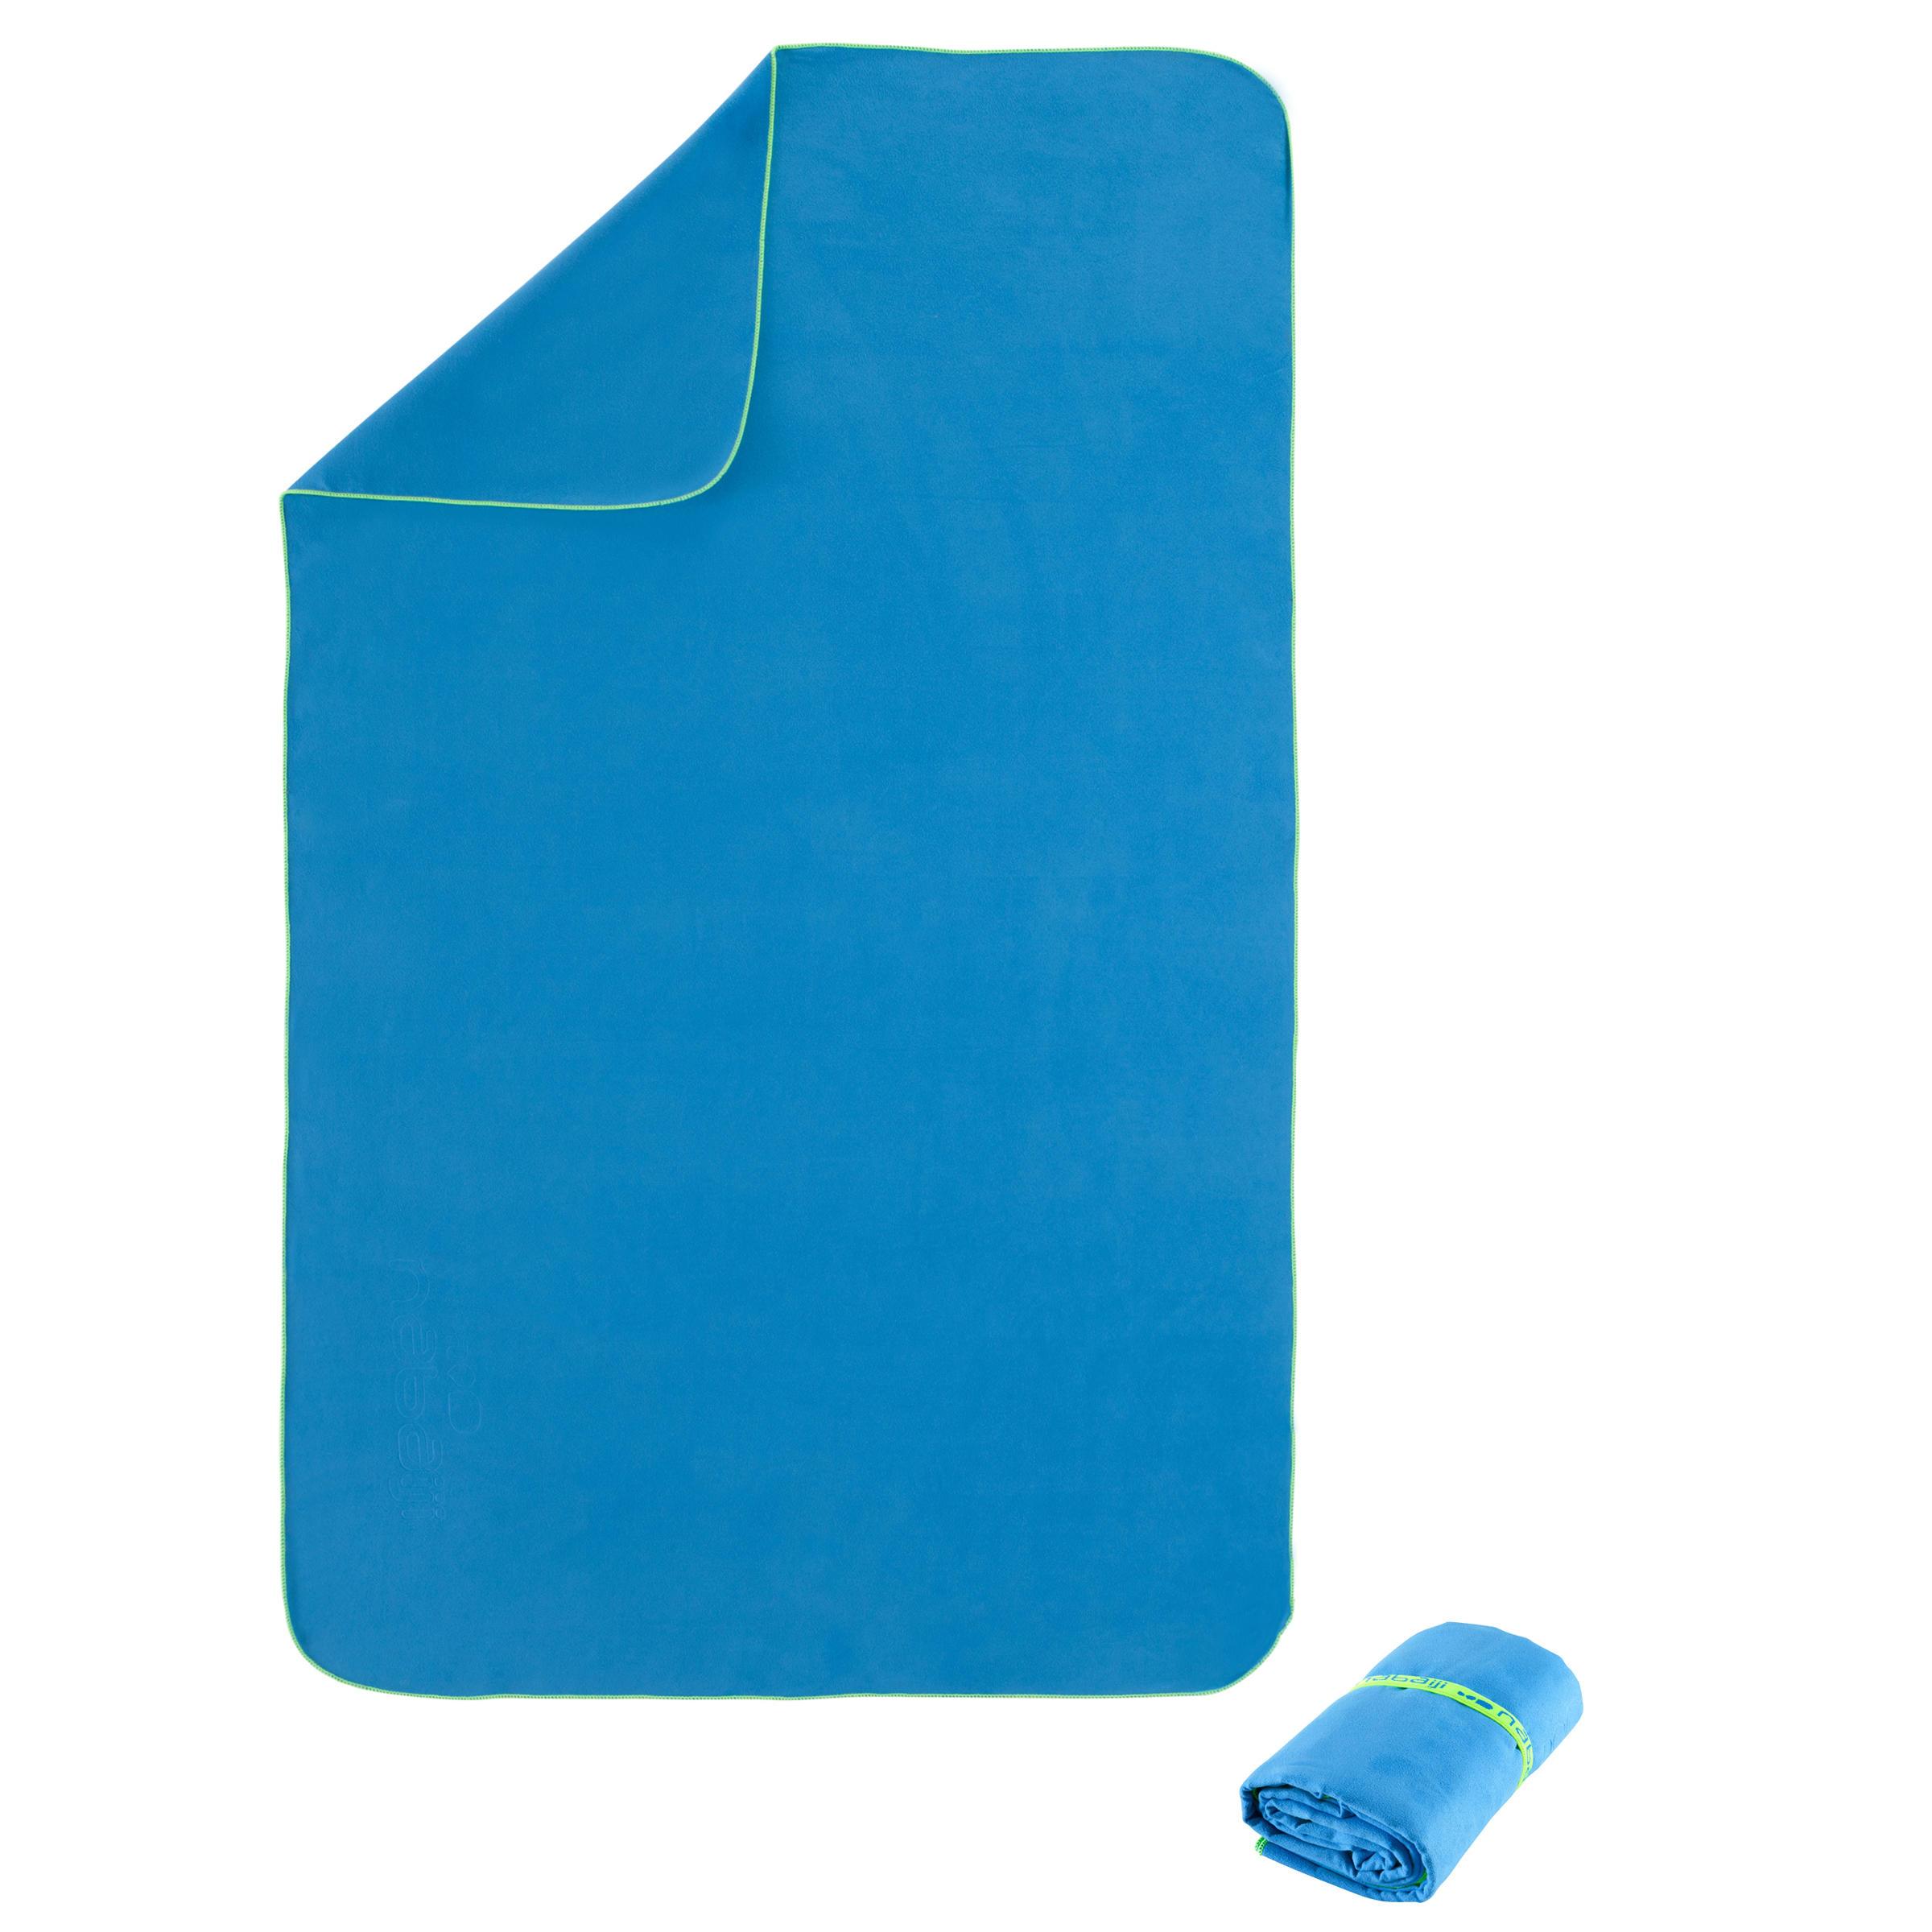 Serviette microfibre bleu cina ultra compacte taille TG 110 x 175 cm